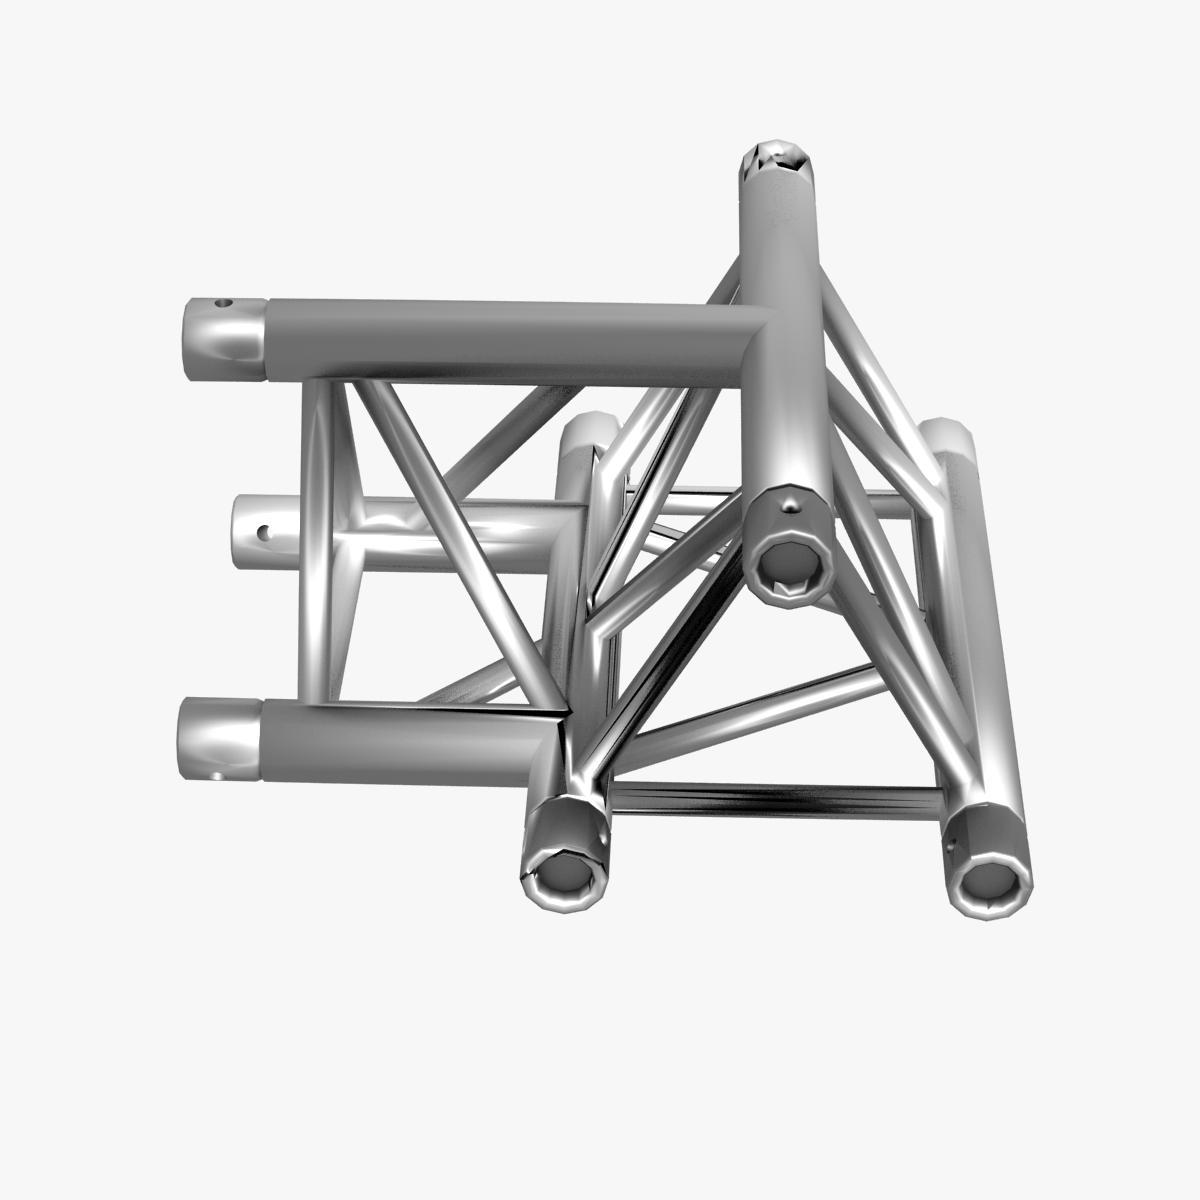 1200x1200 Triangular Truss Standard (Collection 41 Modular Pieces) By Canan85